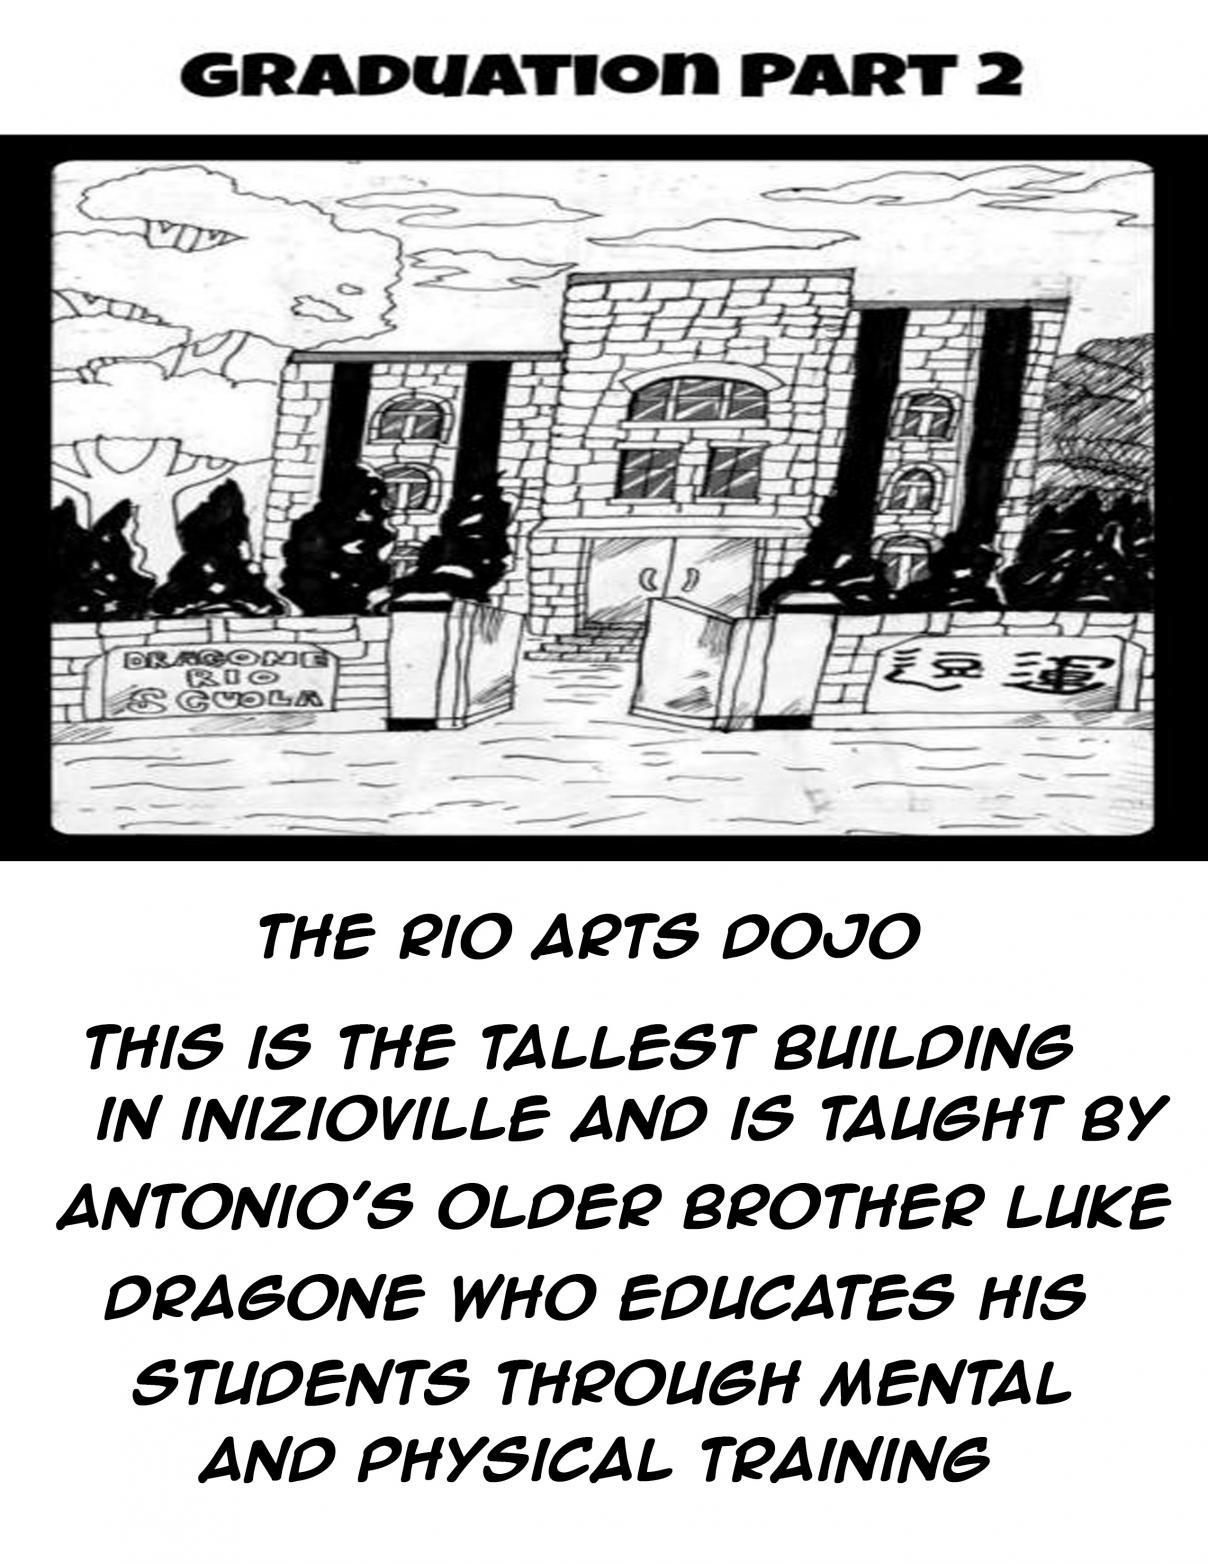 https://img2.nineanime.com/comics/pic2/32/31904/891603/138a14eaf4a8c188a6c41cafd9400a30.jpg Page 1